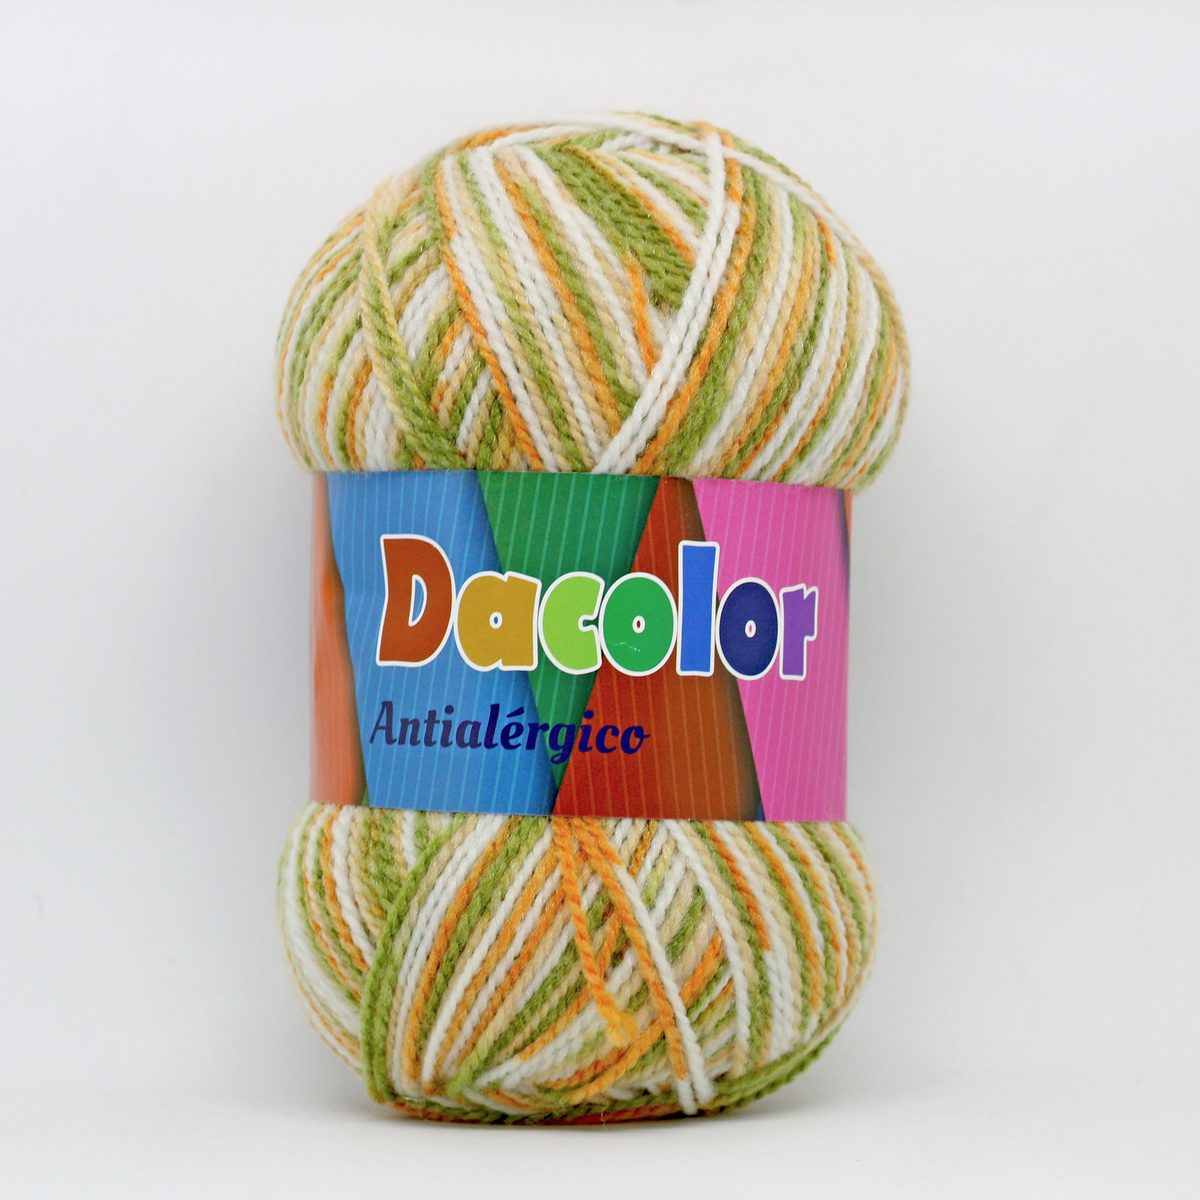 Dacolor - 44